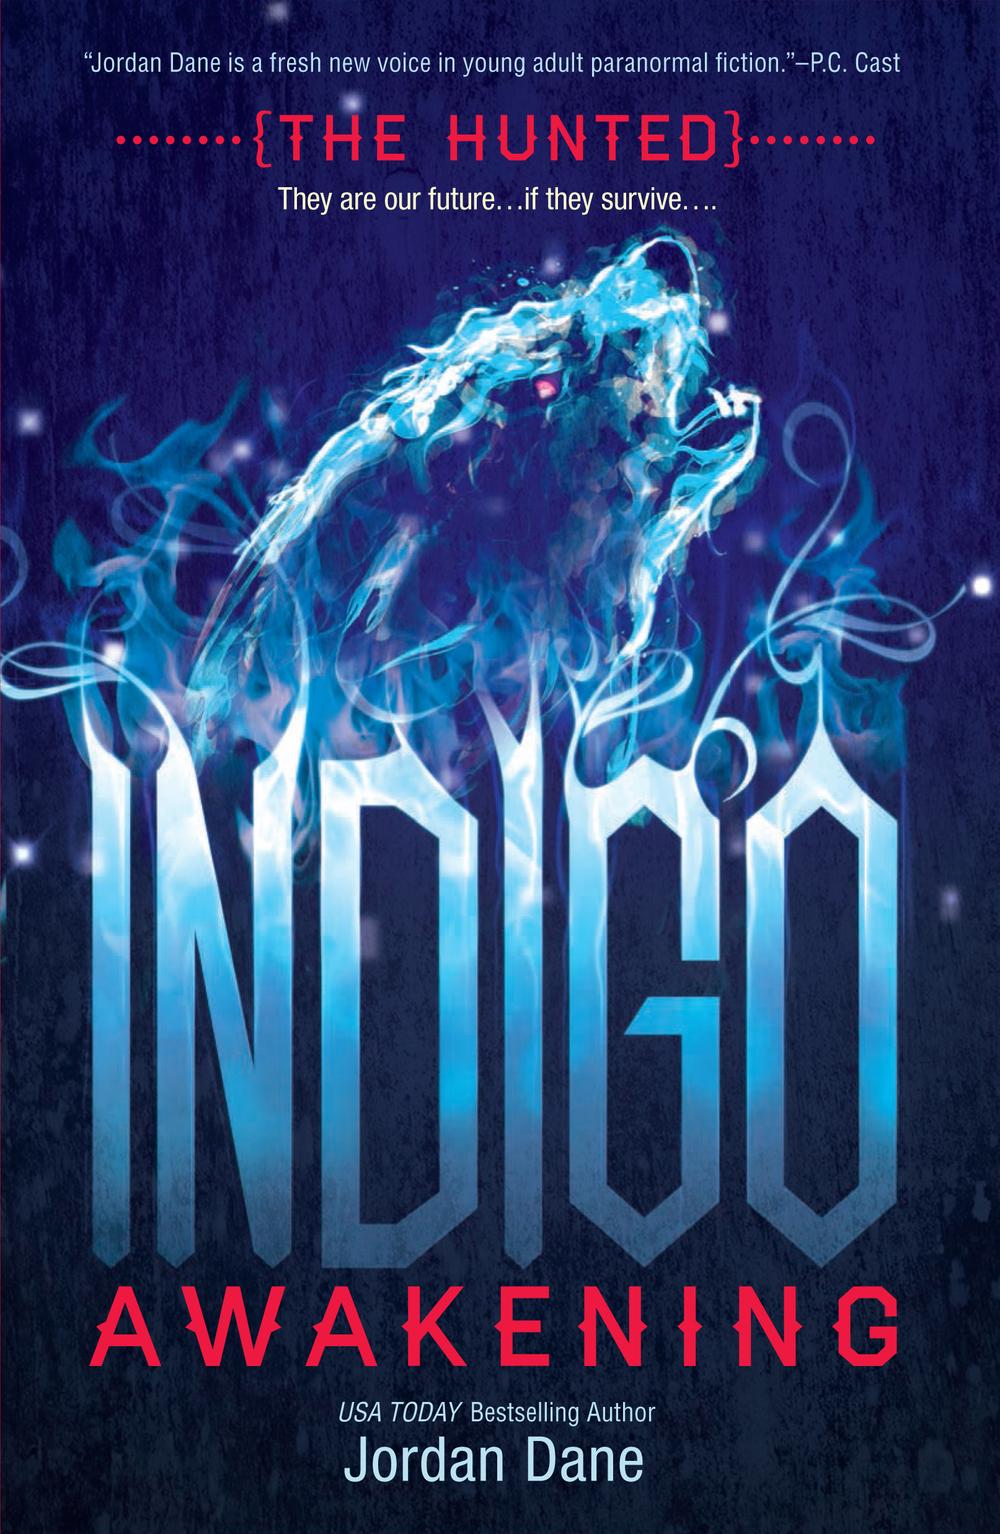 Indigo Awakening_front cover A_opt.jpg